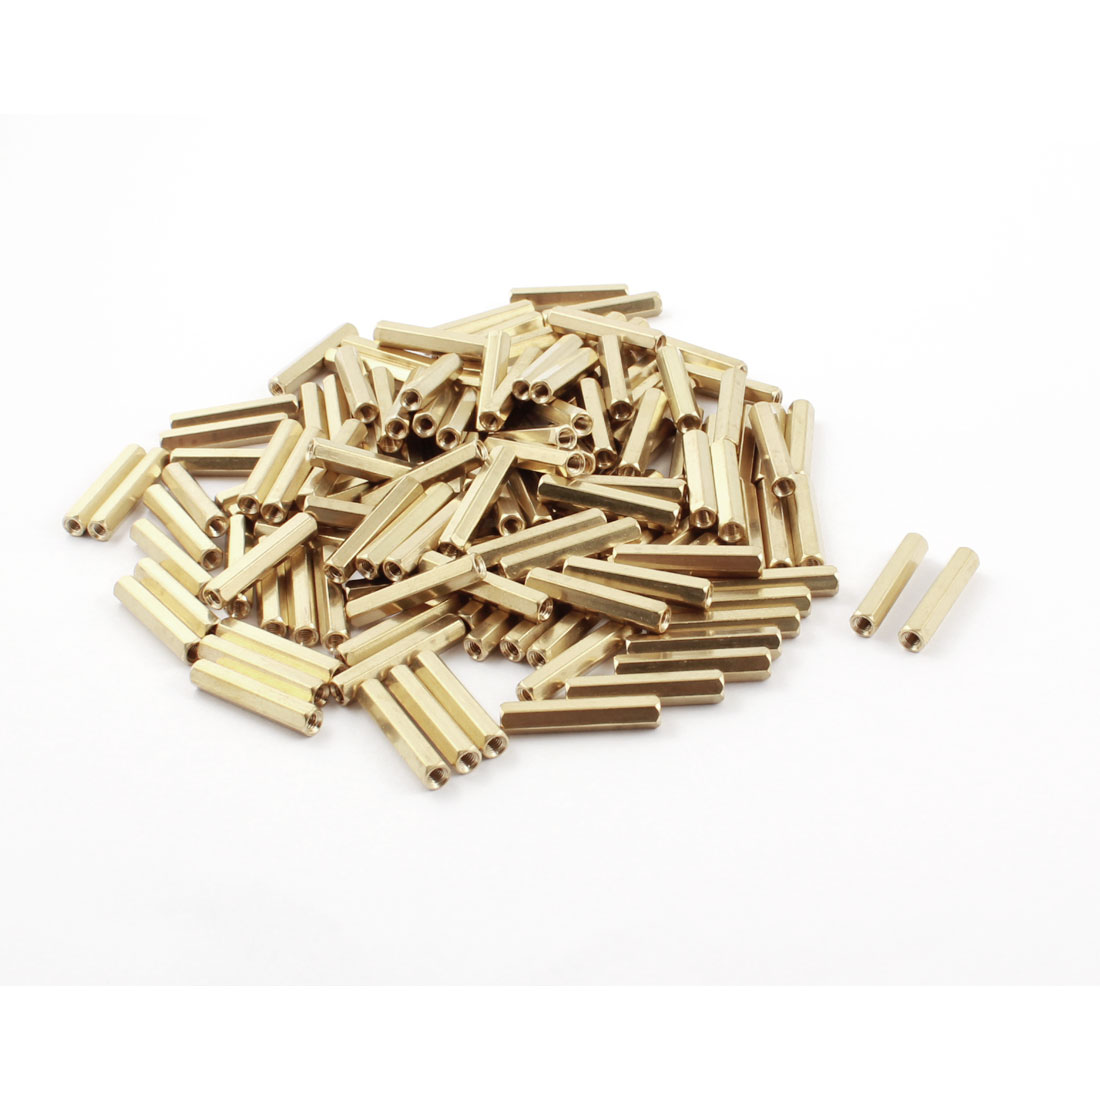 120Pcs M3 x 25mm Female Thread Dual Ends Brass Pillar PCB Standoff Hexagonal Nut Spacer